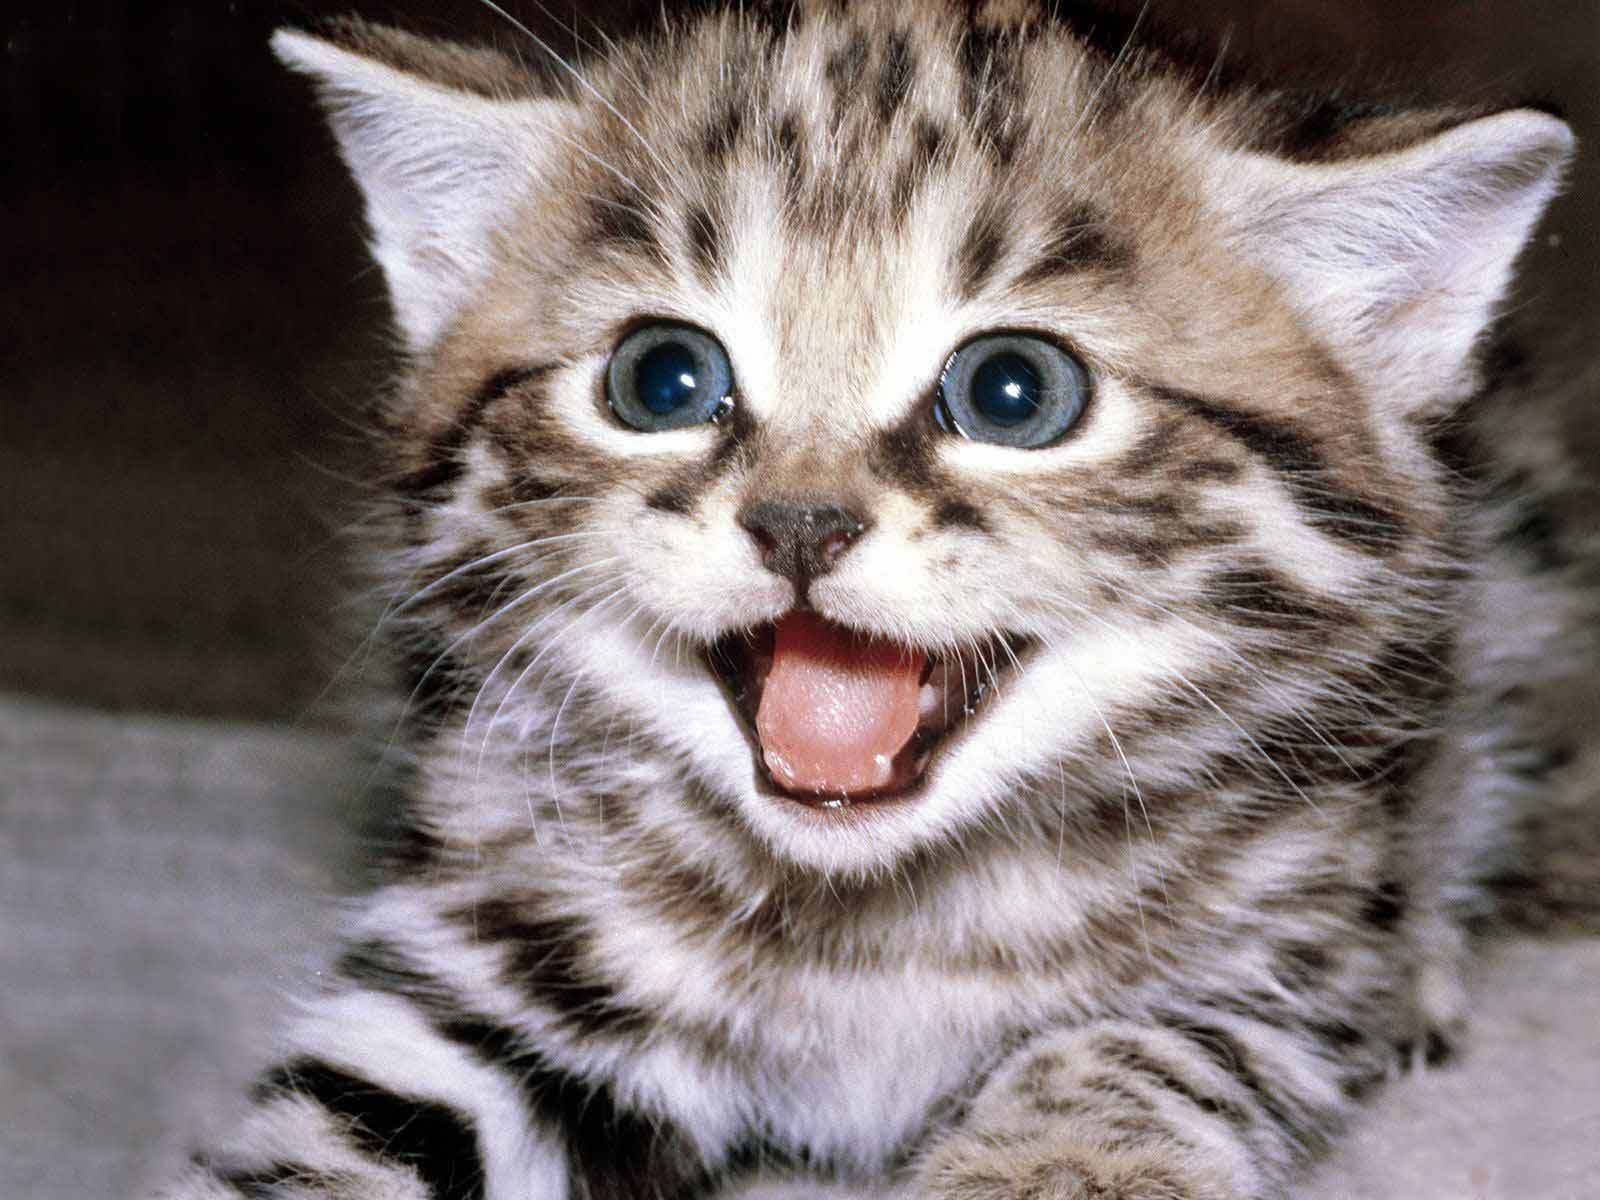 cute kittens lifesfinewhine